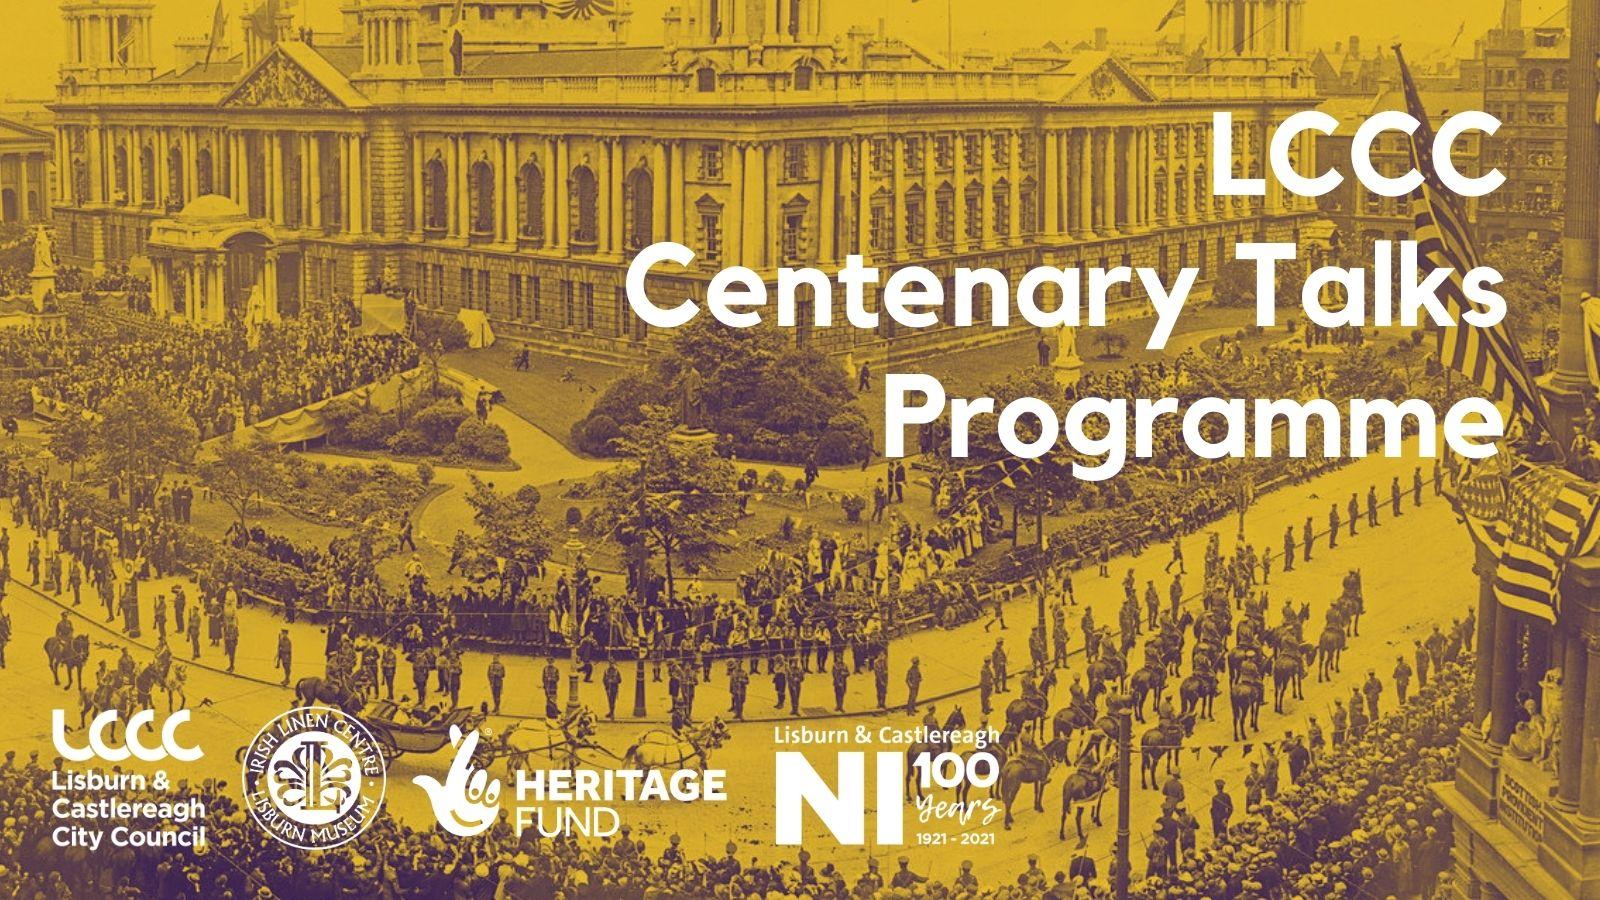 Poster: LCCC Centenary Talks Programme